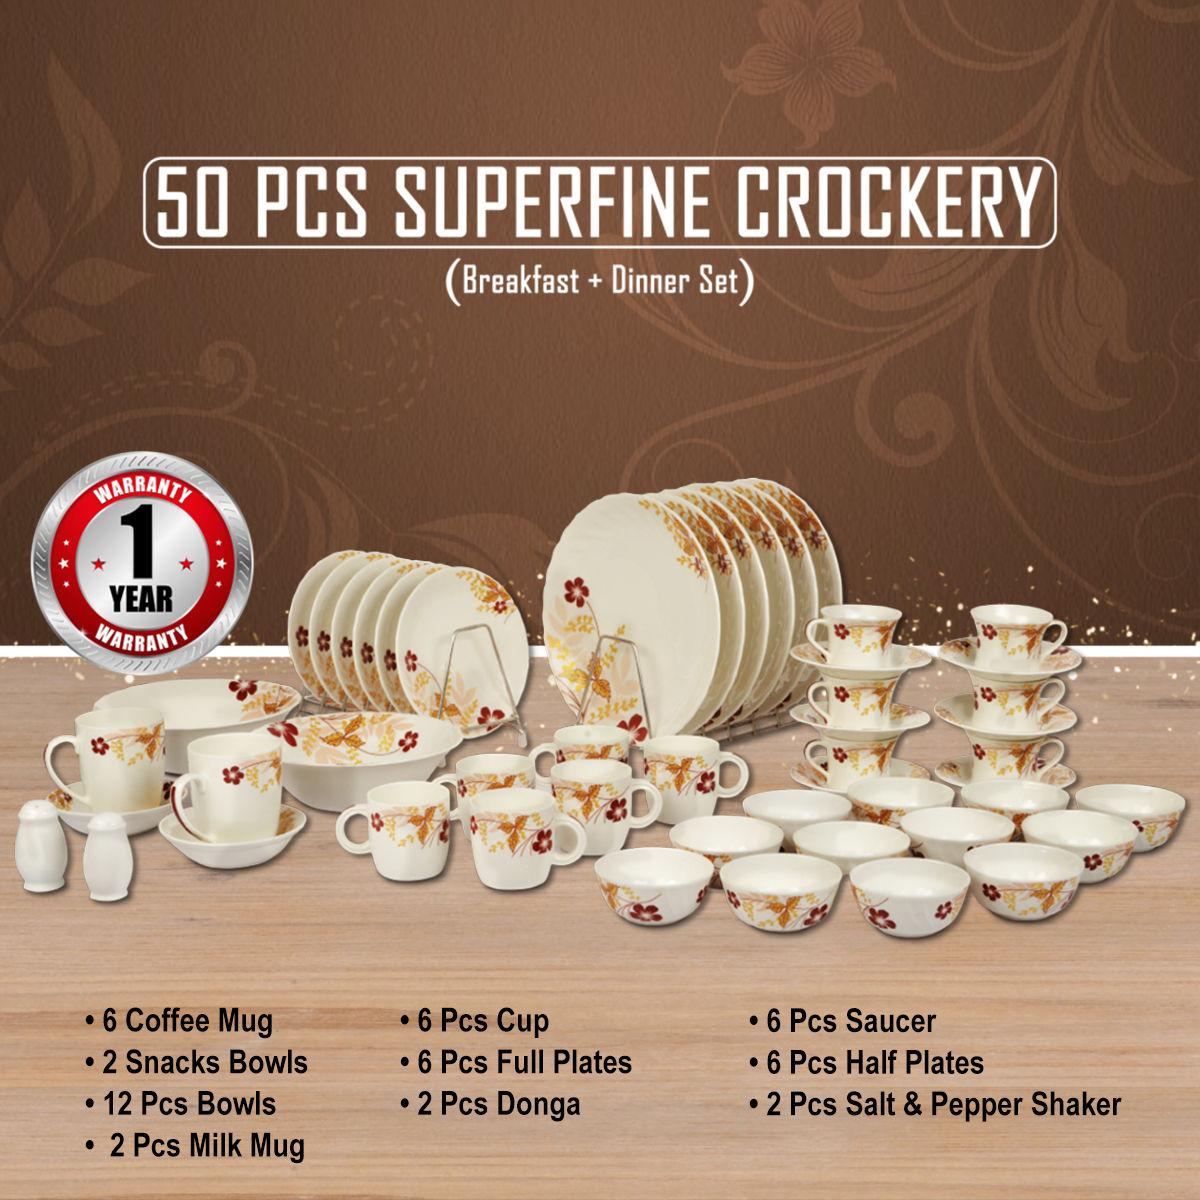 50 Pcs Superfine Crockery Set & Buy 50 Pcs Superfine Crockery Set Online at Best Price in India on ...